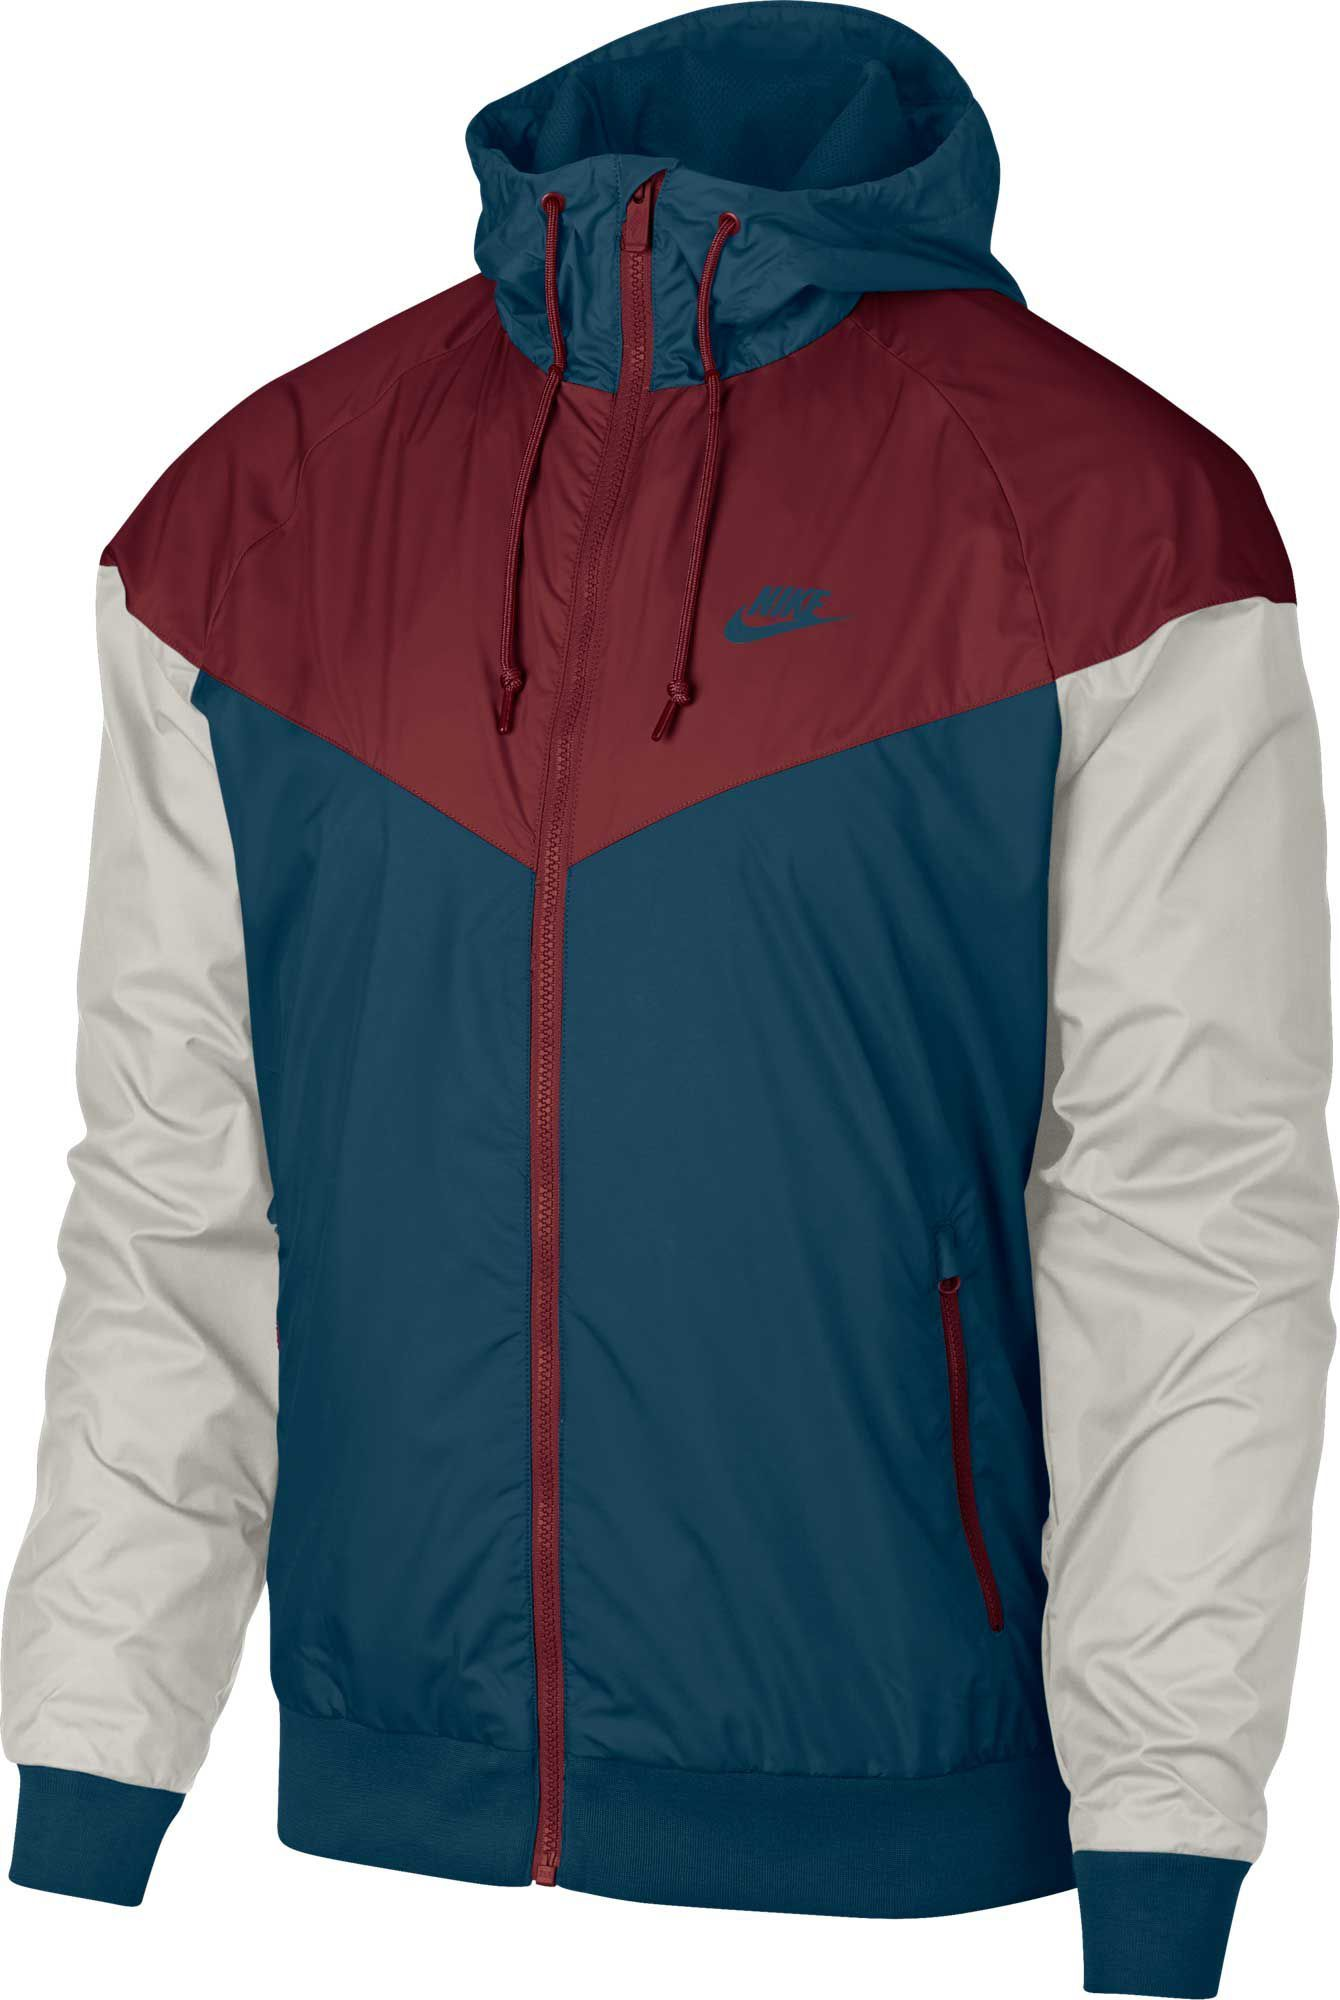 Asesorar Fonética Barra oblicua  Nike Men's Windrunner Full Zip Jacket | Football fashion ...